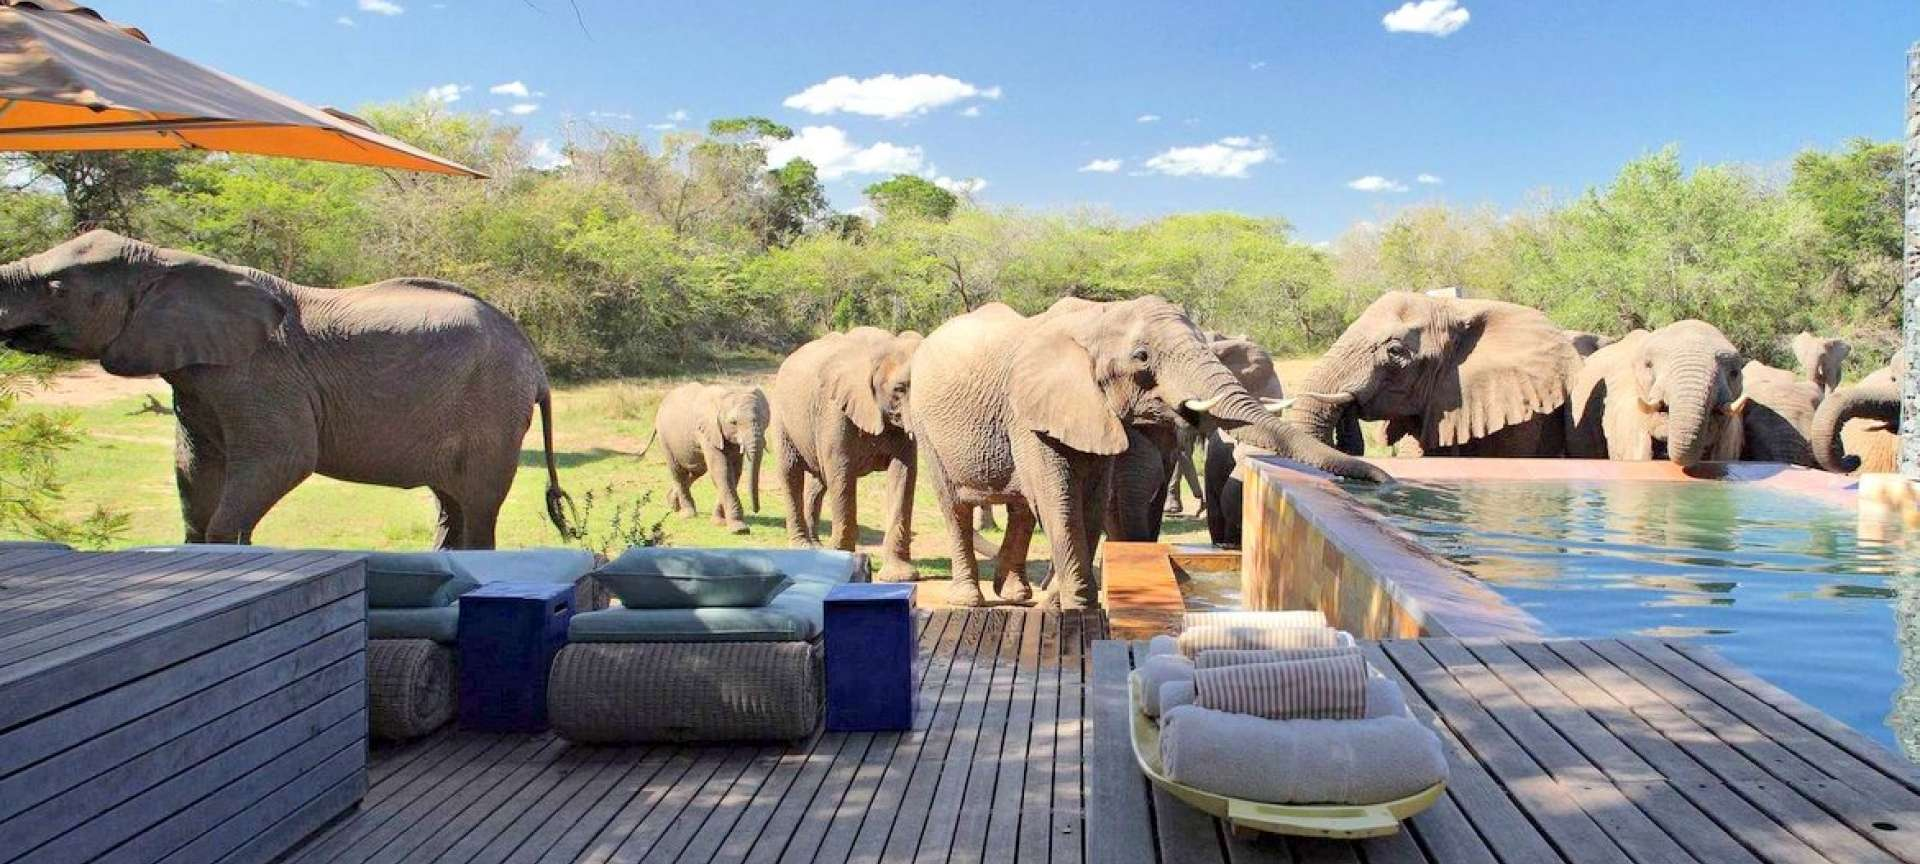 Phinda Game Reserve - Africa Wildlife Safaris